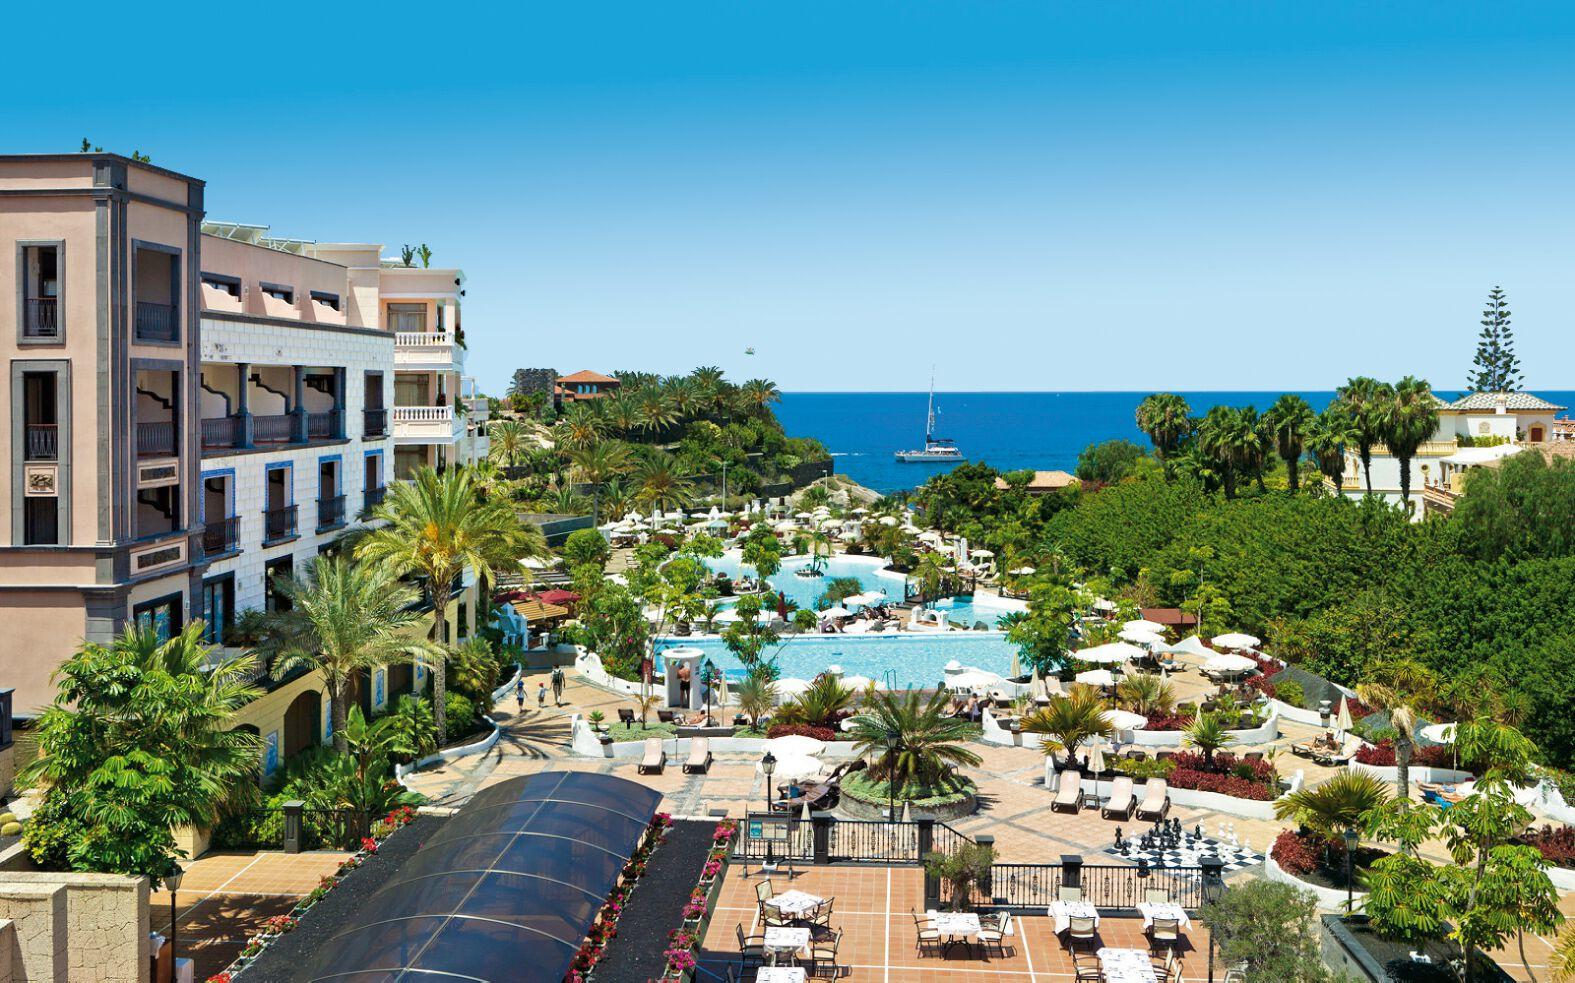 Séjour Tenerife - Gran Tacande Wellness & Relax Costa Adeje - 5*